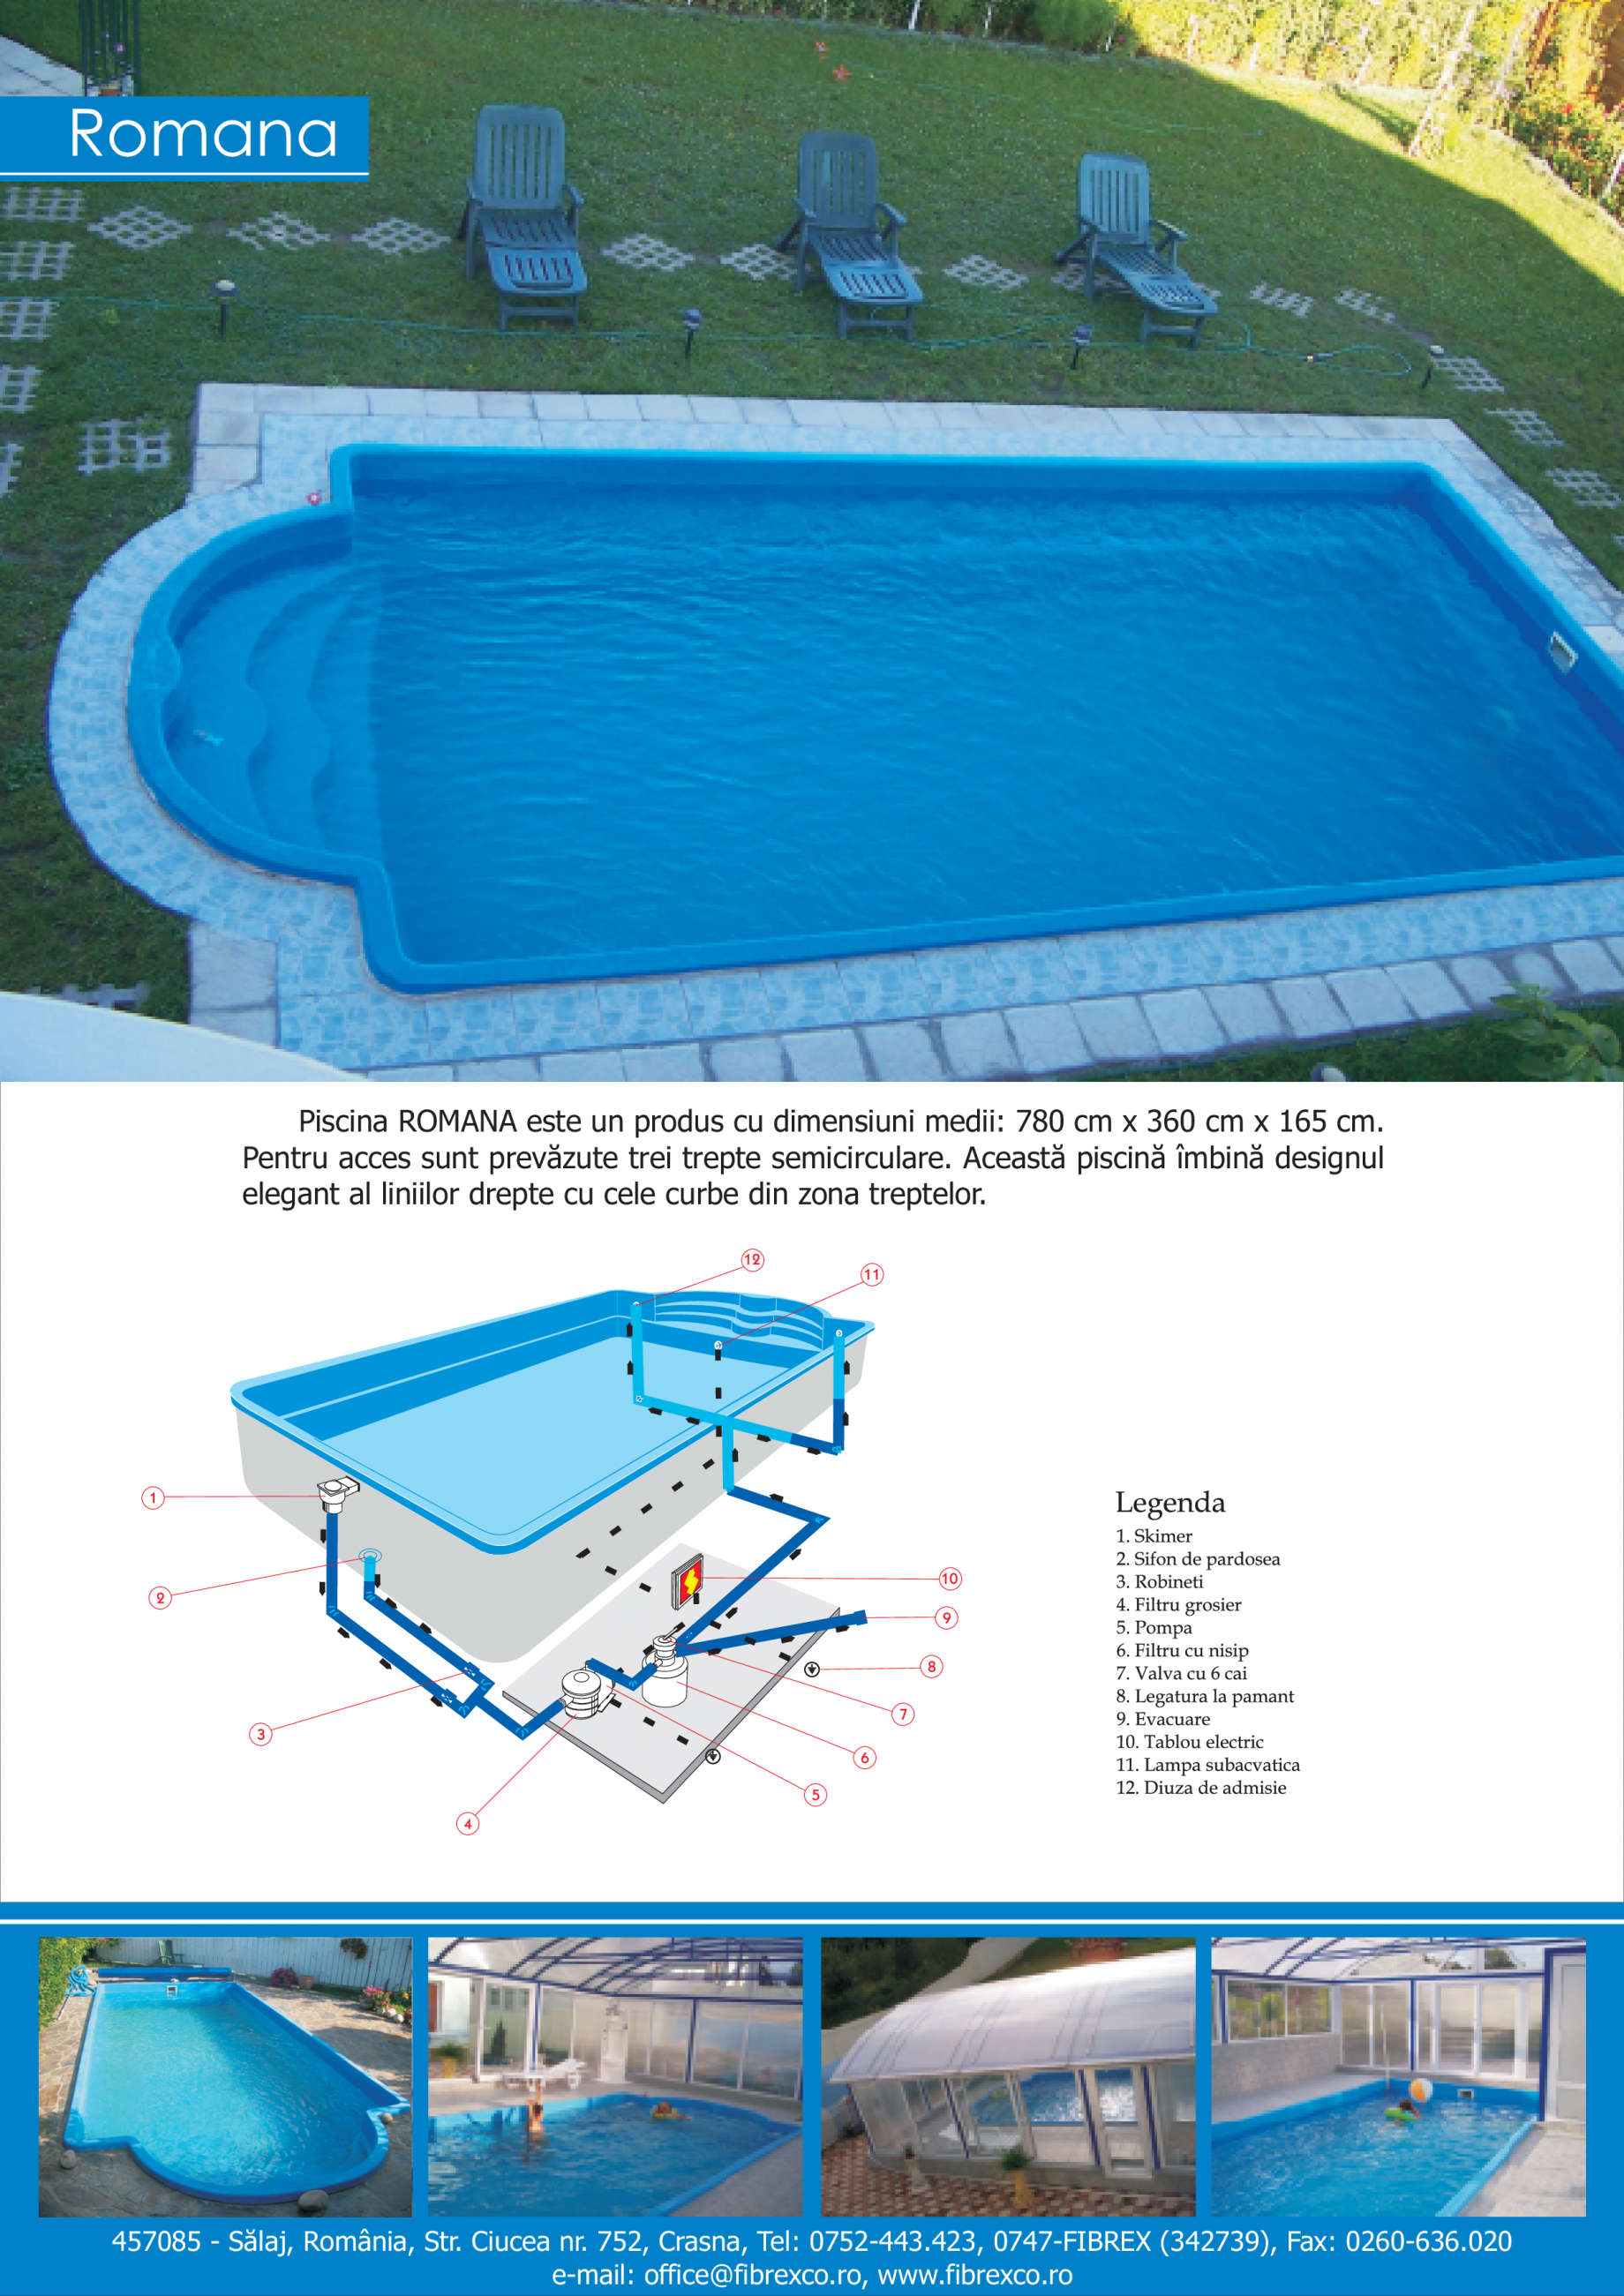 Fisa tehnica piscine ingropate romana fibrex piscine for Piscine ingropate